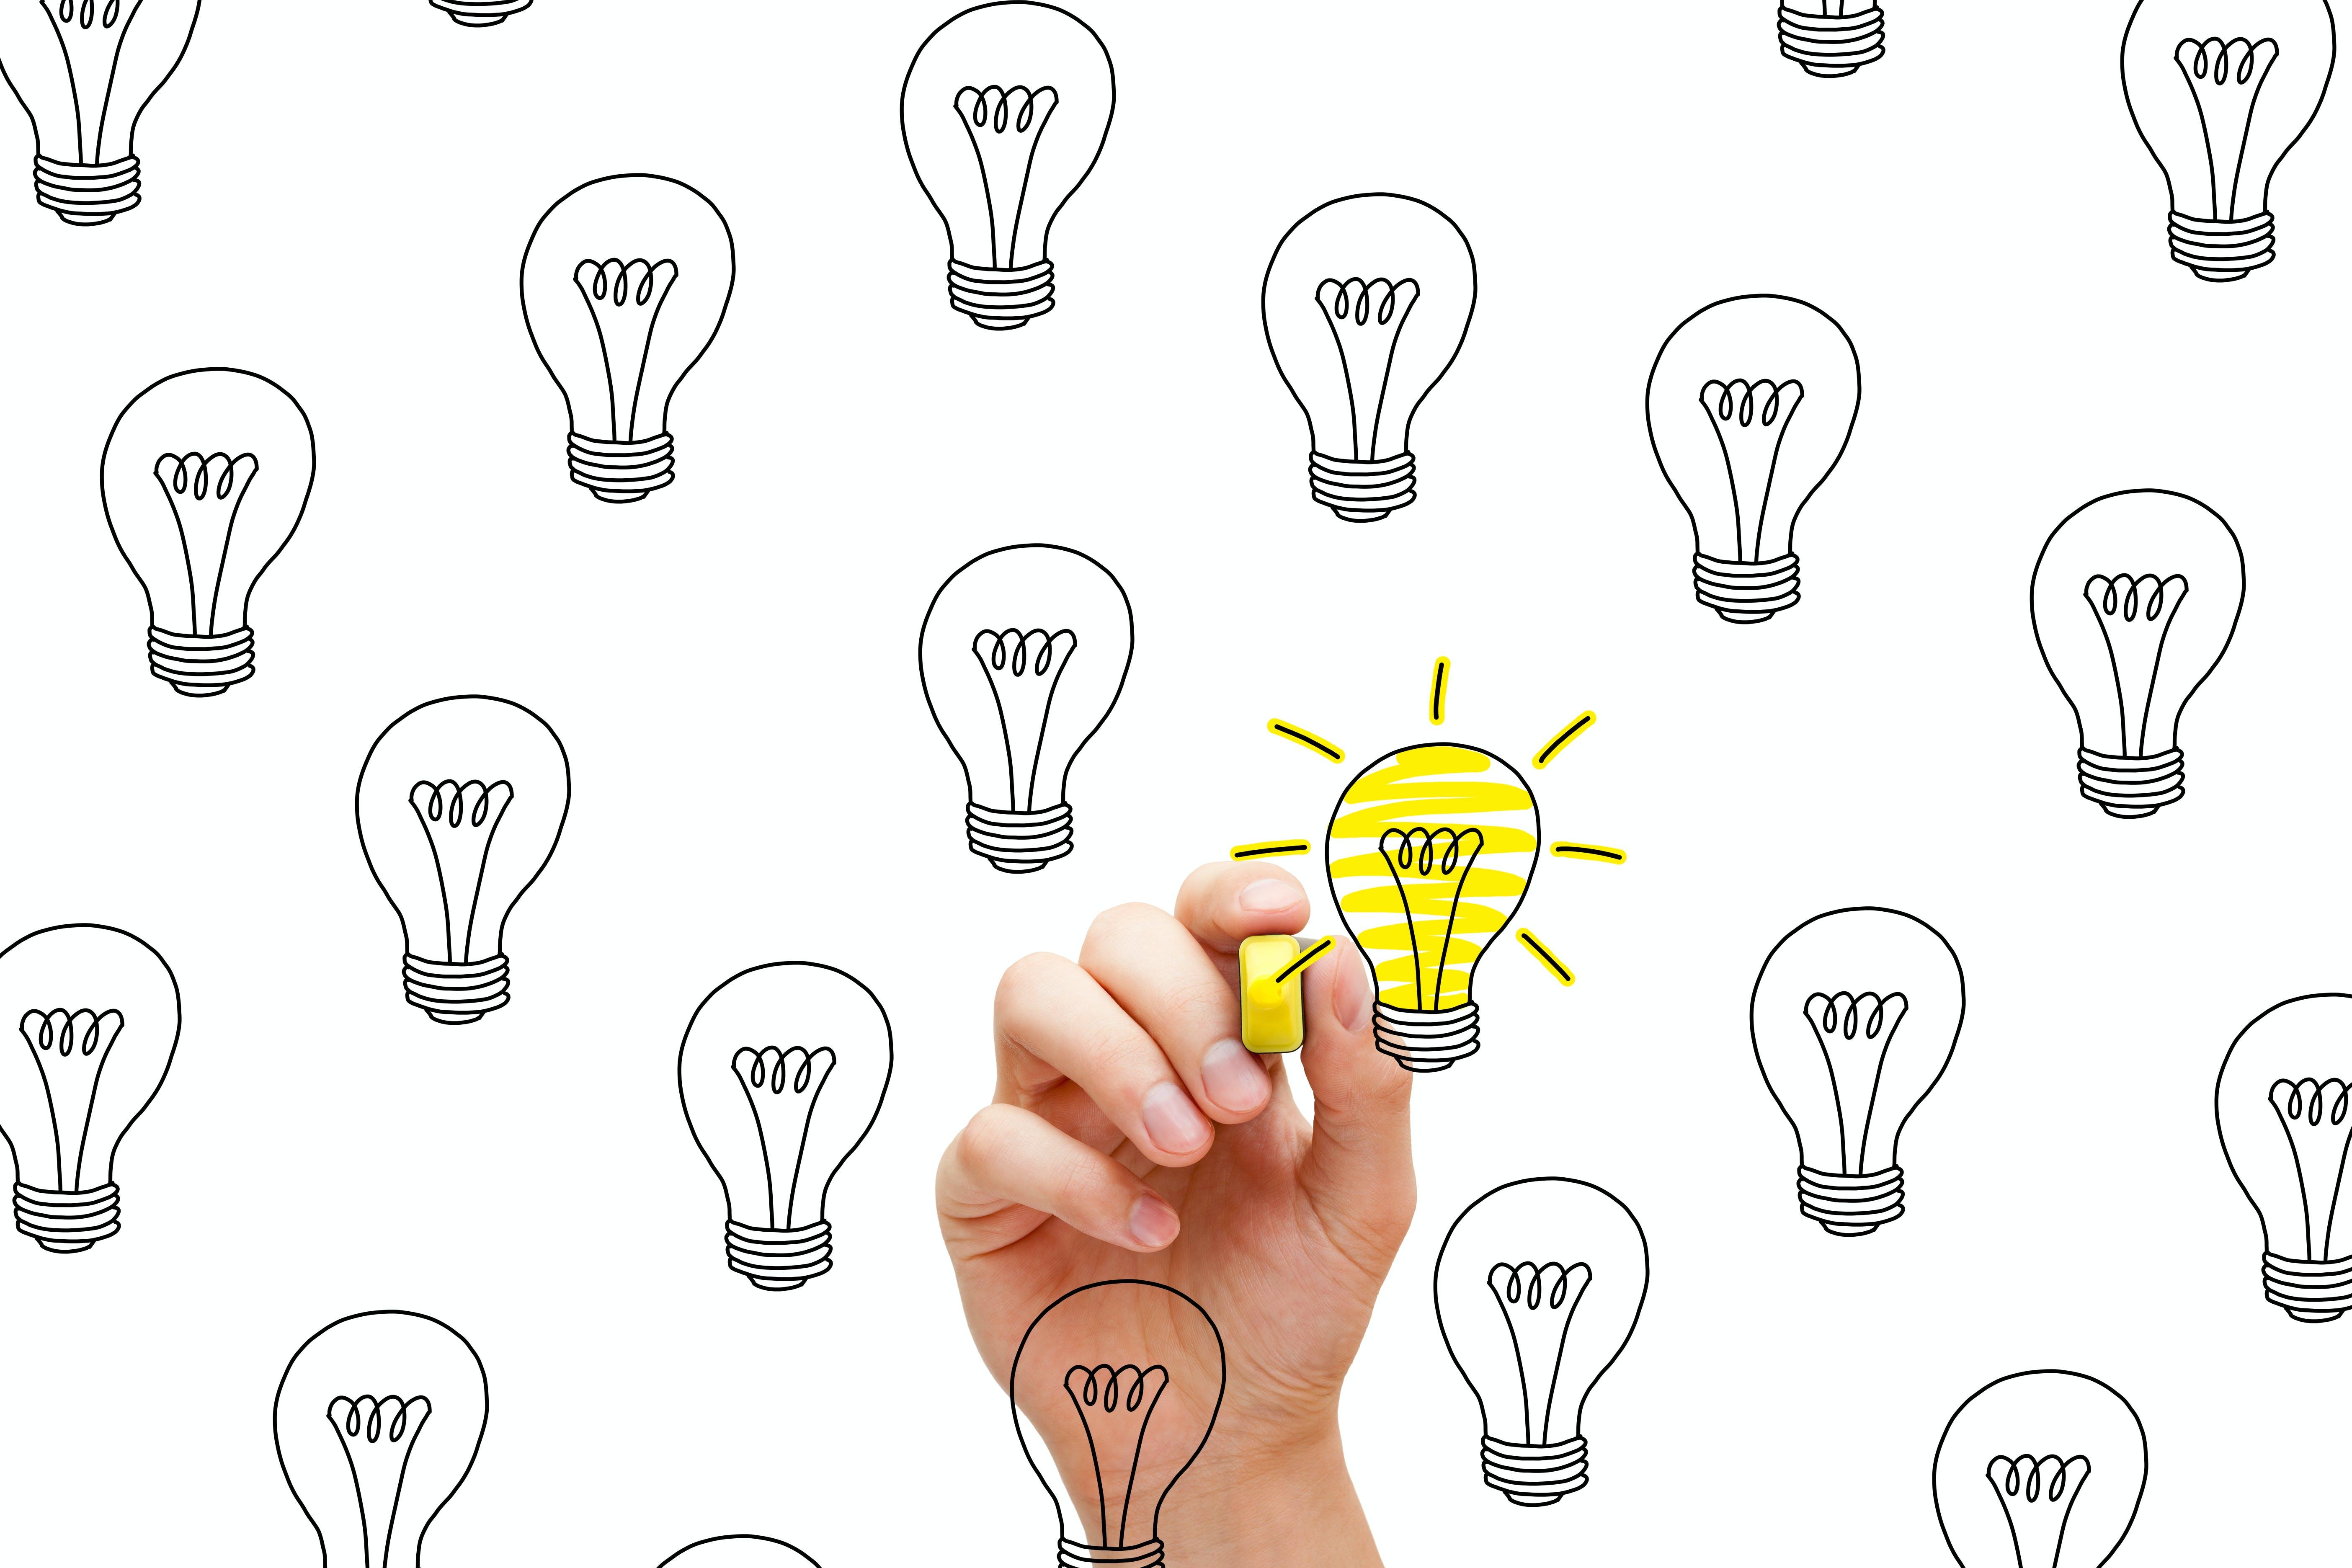 Lightbulbs with hand